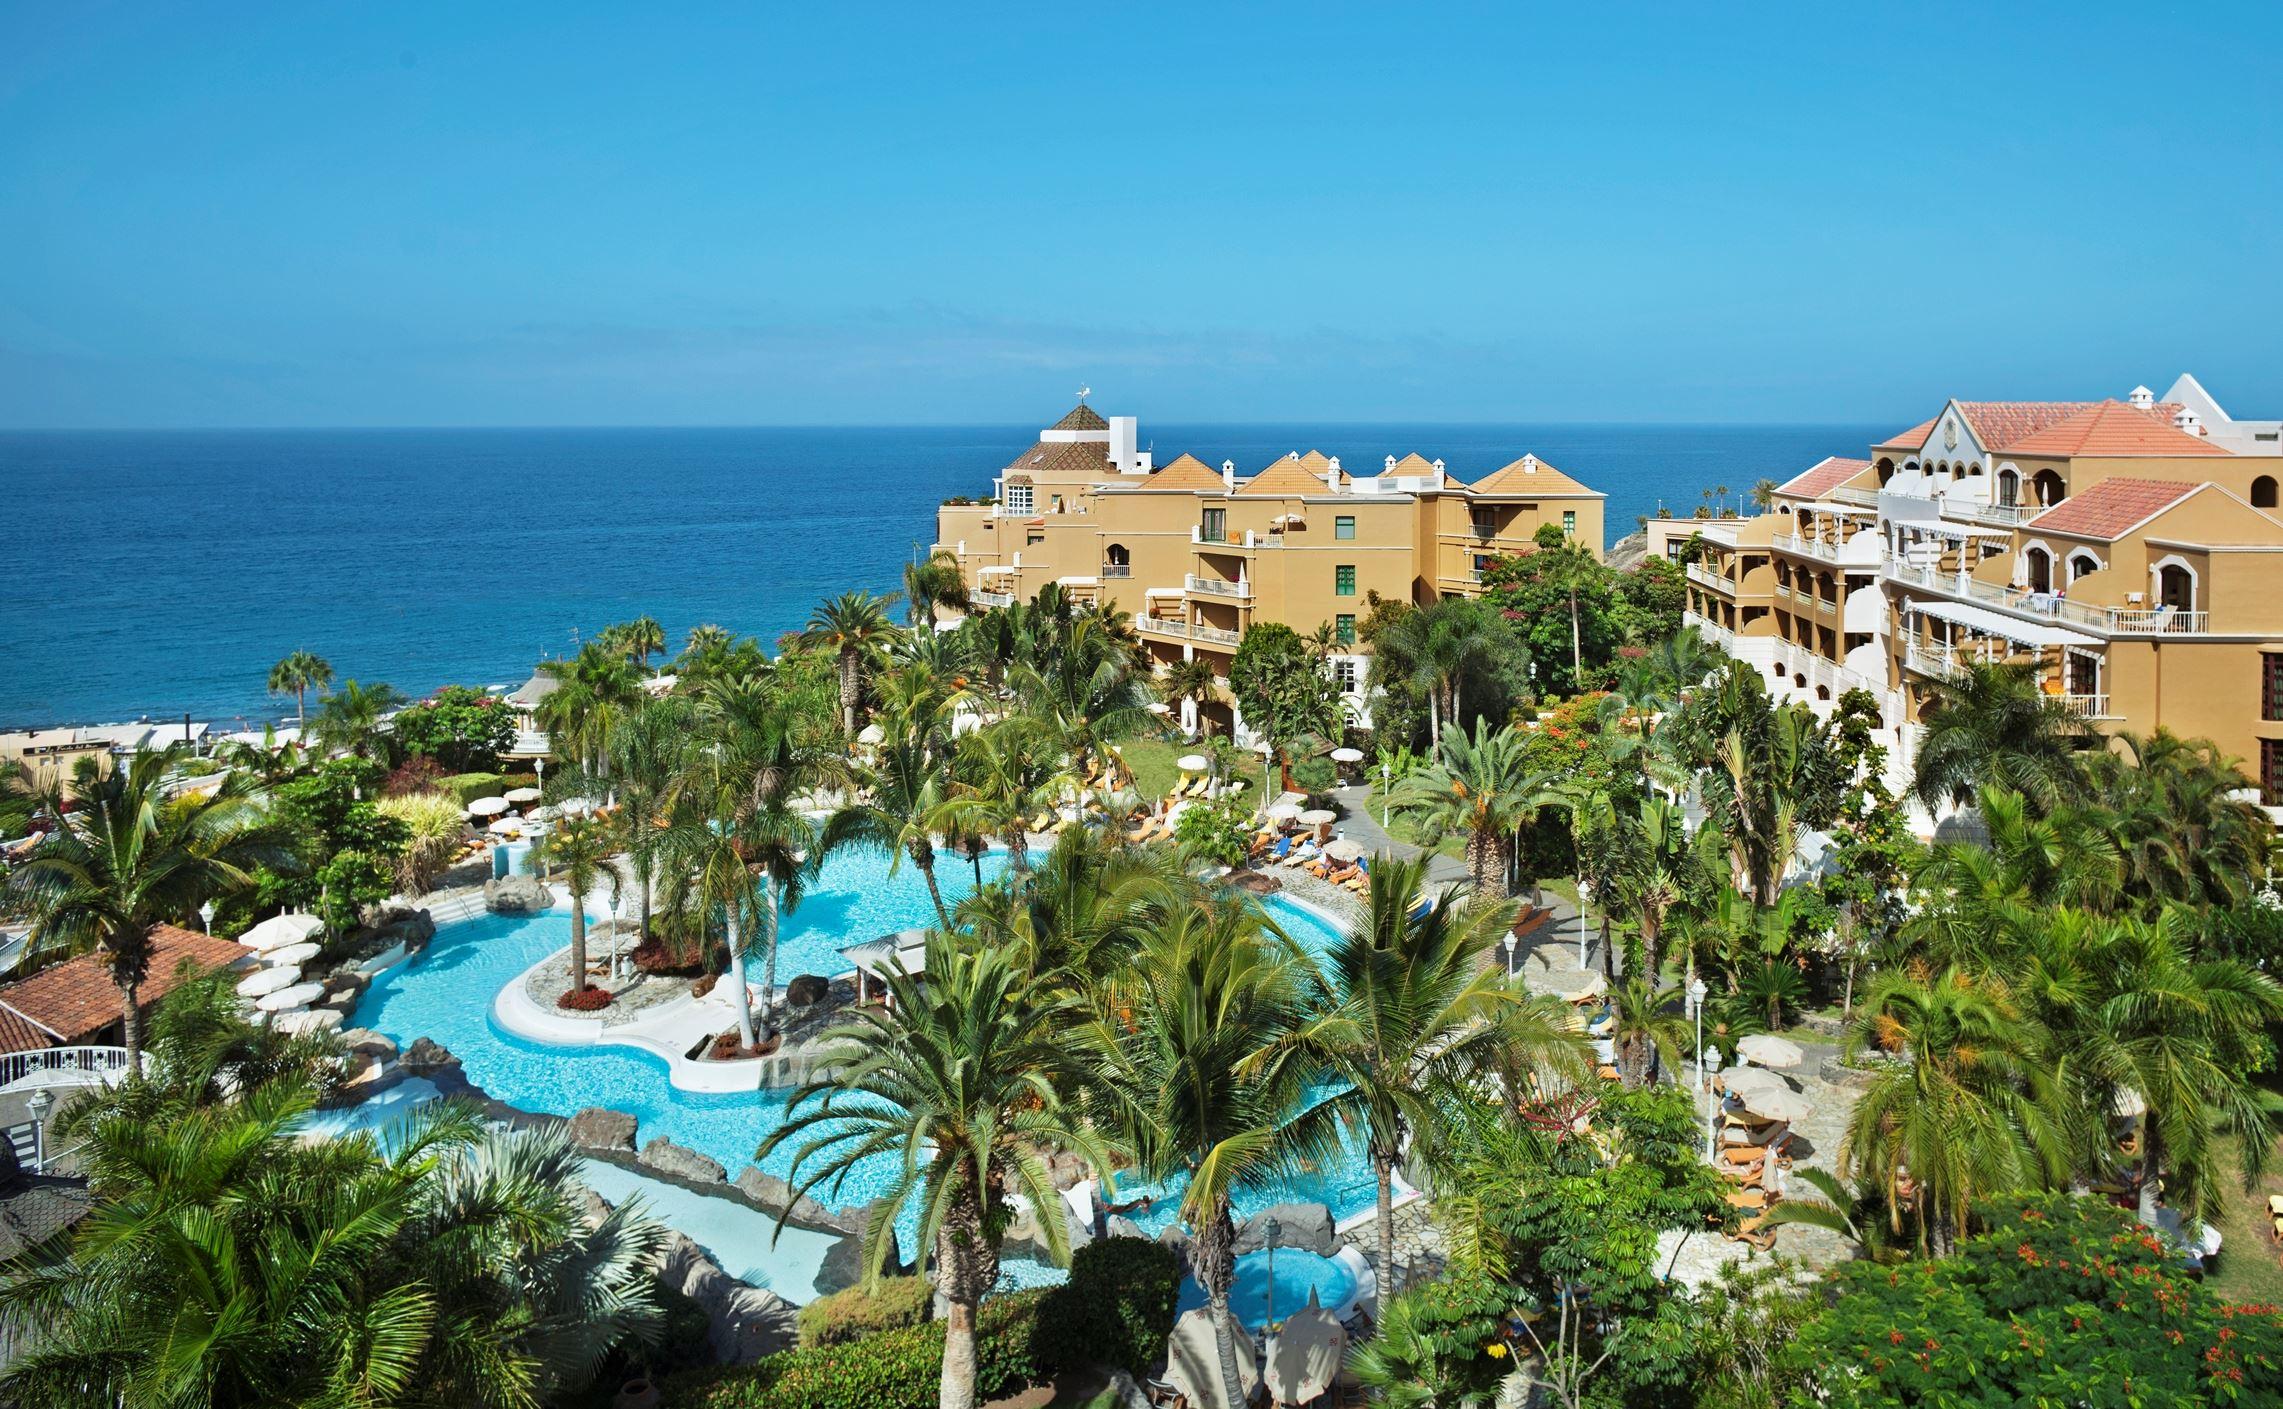 Hotell Jardines de Nivaria, Playa de Fanabe Teneriffa